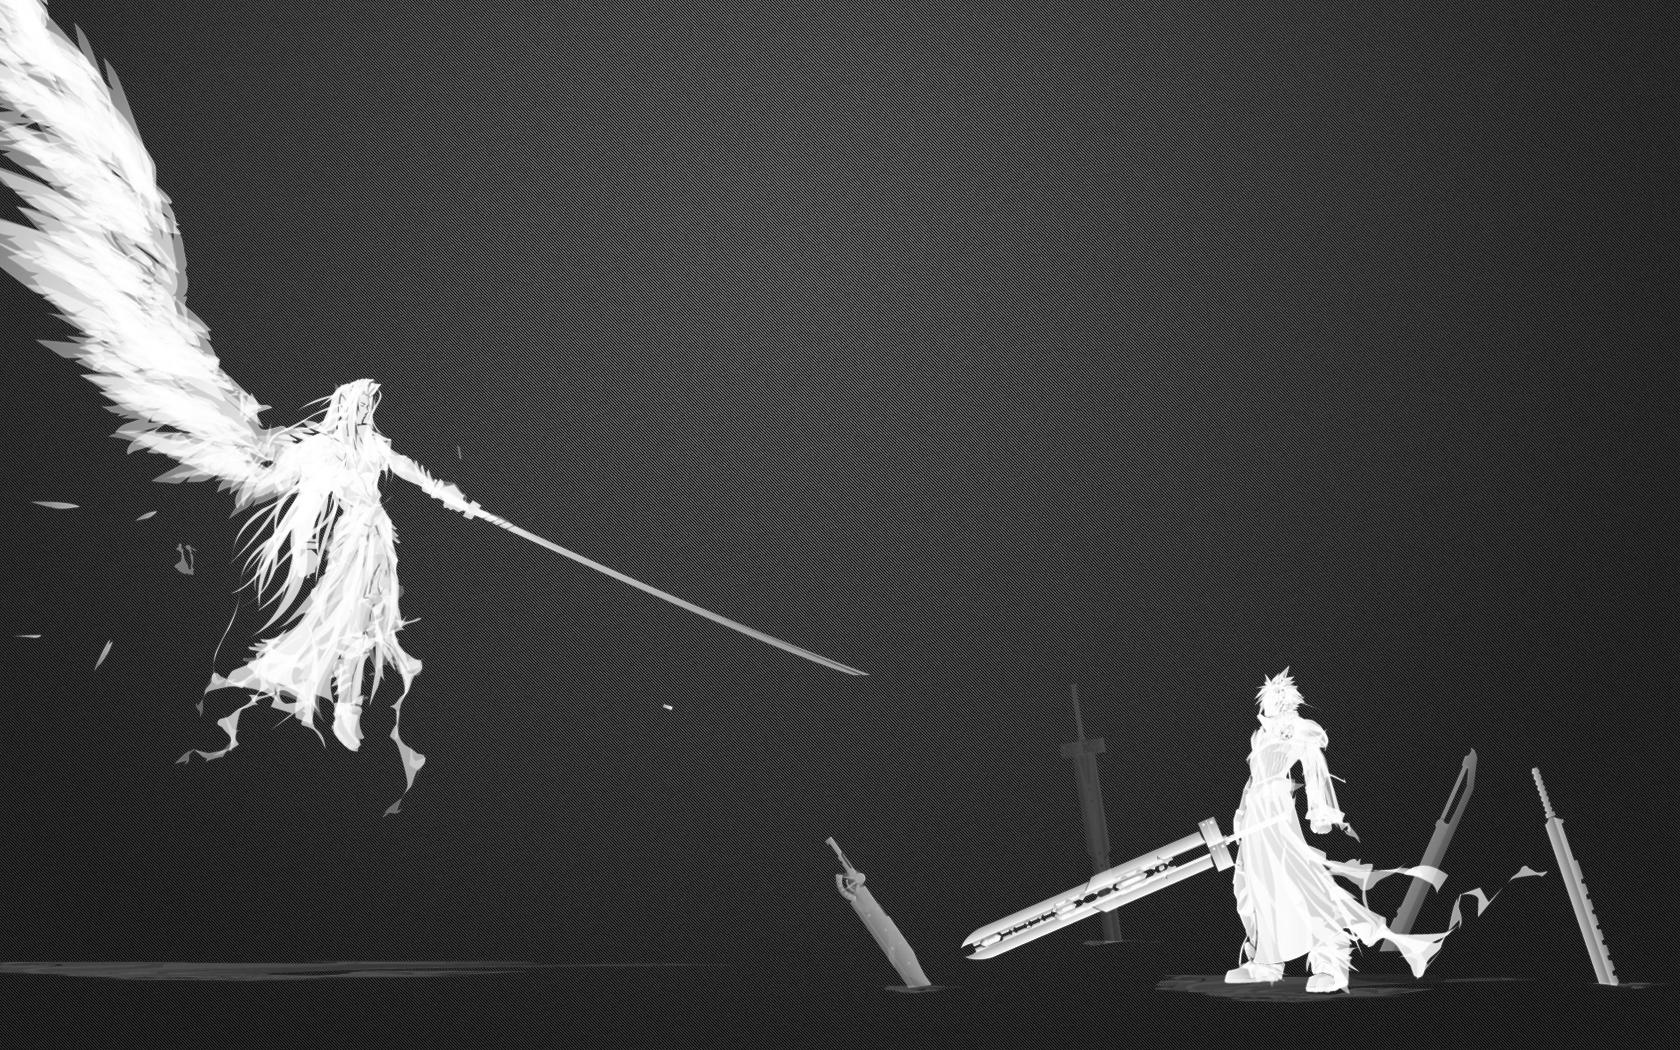 Fantasy Wallpaper 1680x1050 Final Fantasy VII Sephiroth Cloud 1680x1050